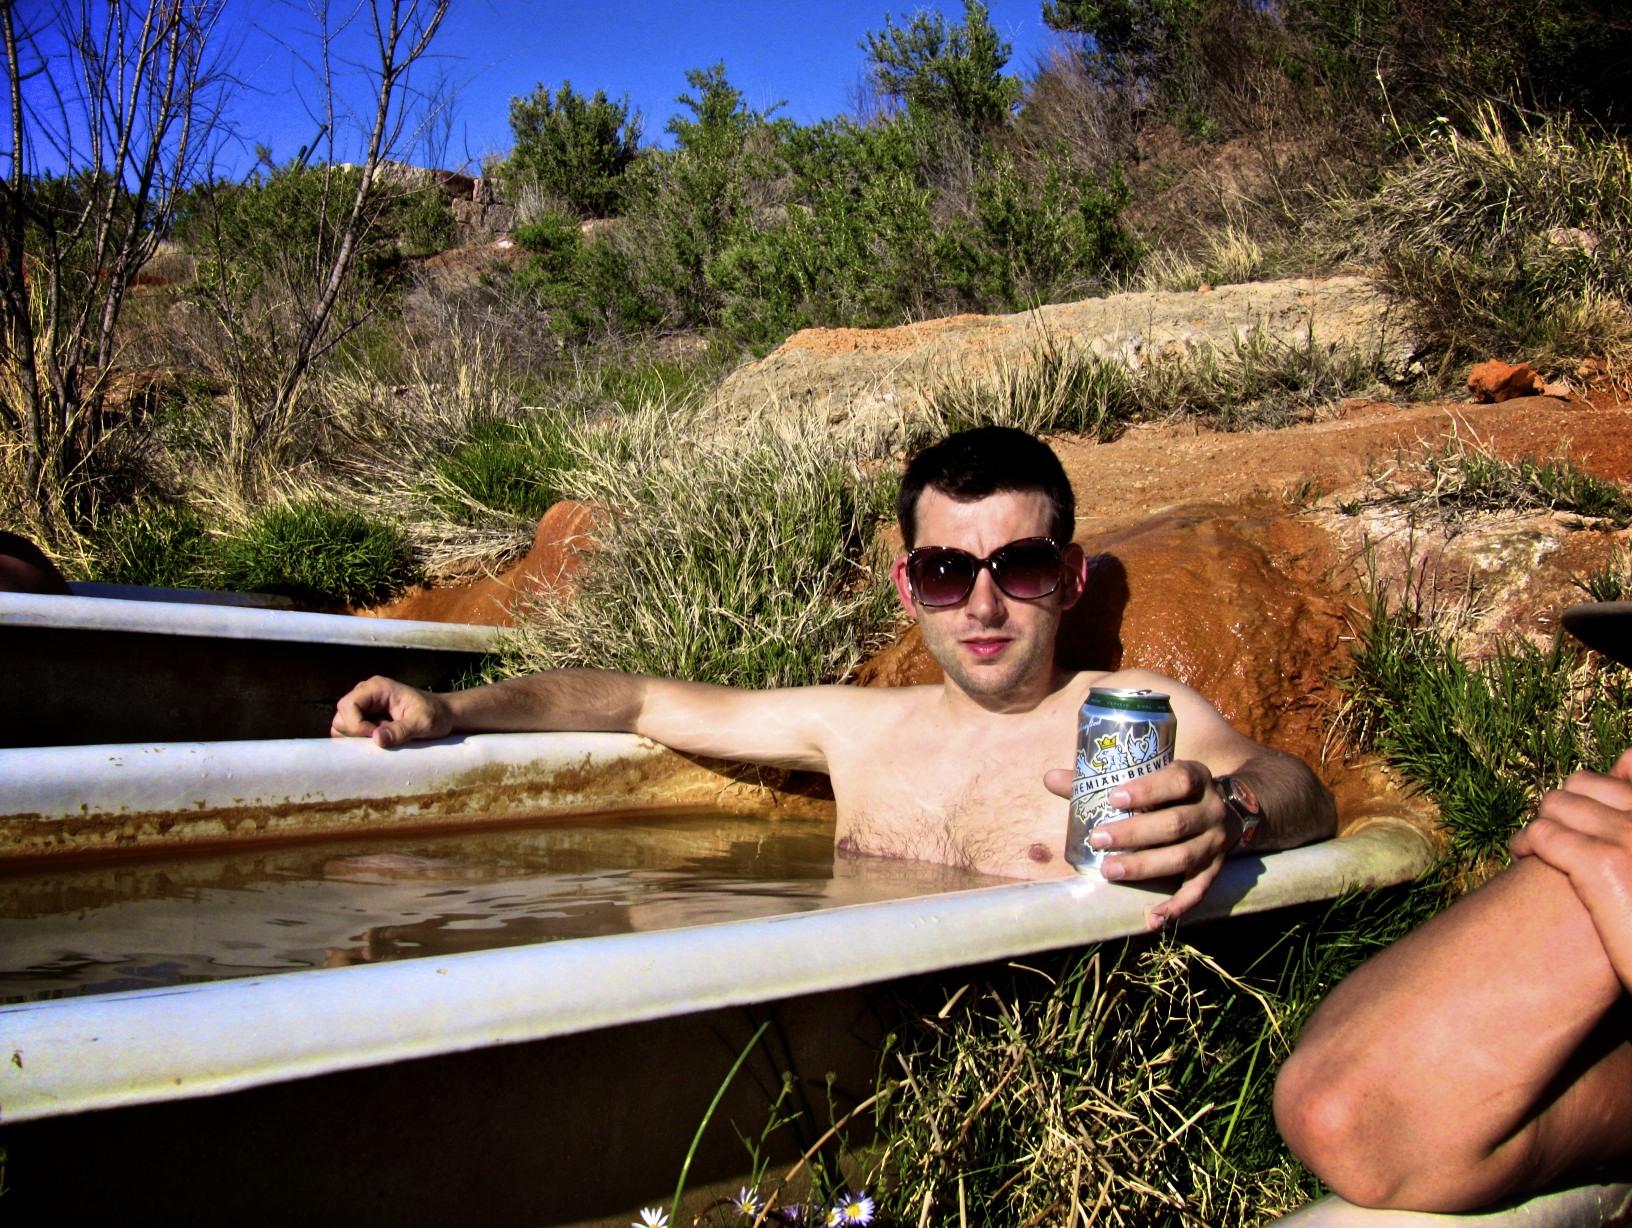 File:German tourist enjoying Mystic Hot Springs bathtubs.jpg ...